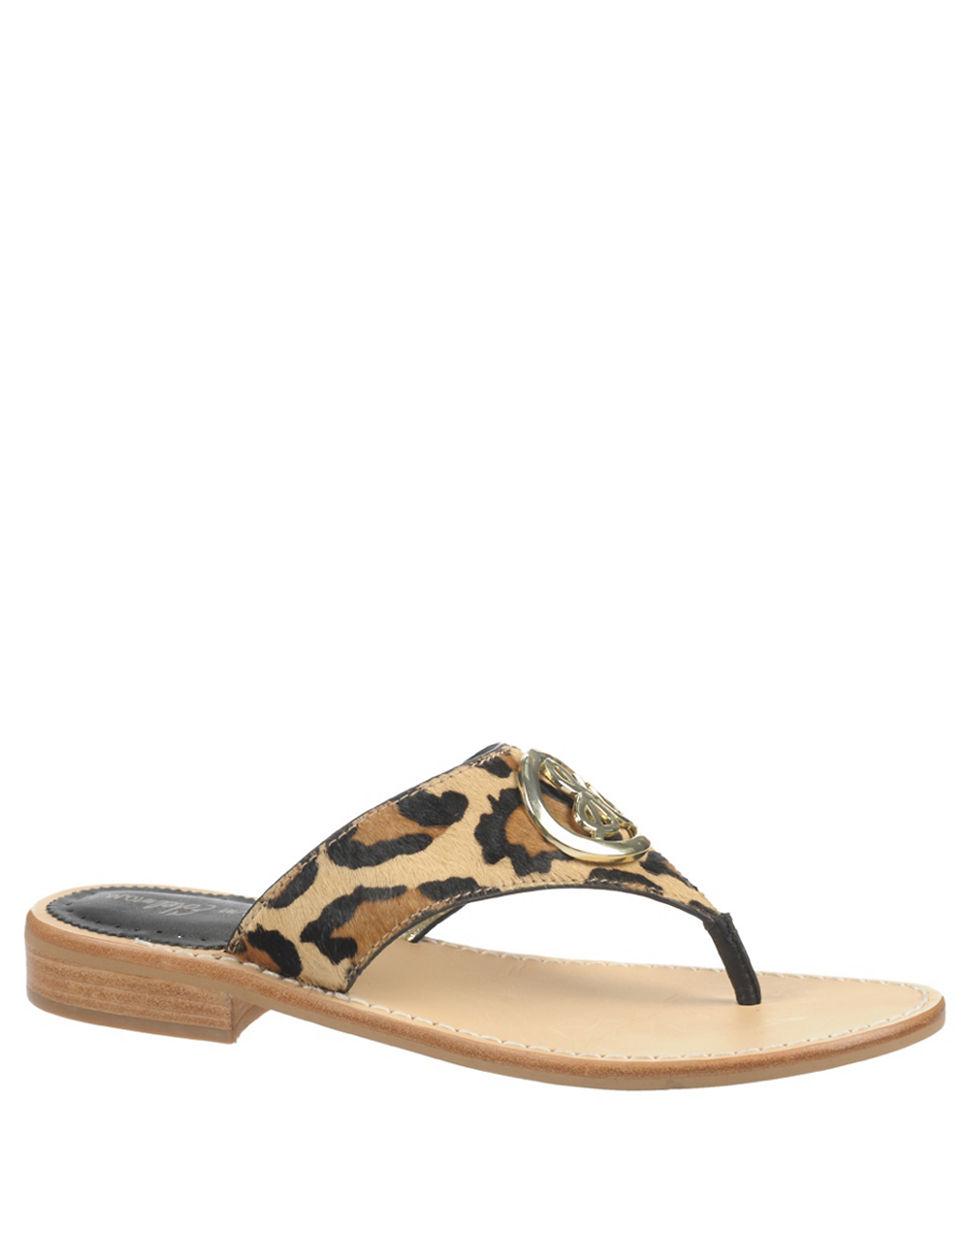 062bb6ff71e Ugg Australia Allaria Metallic Leopard Flat Sandals